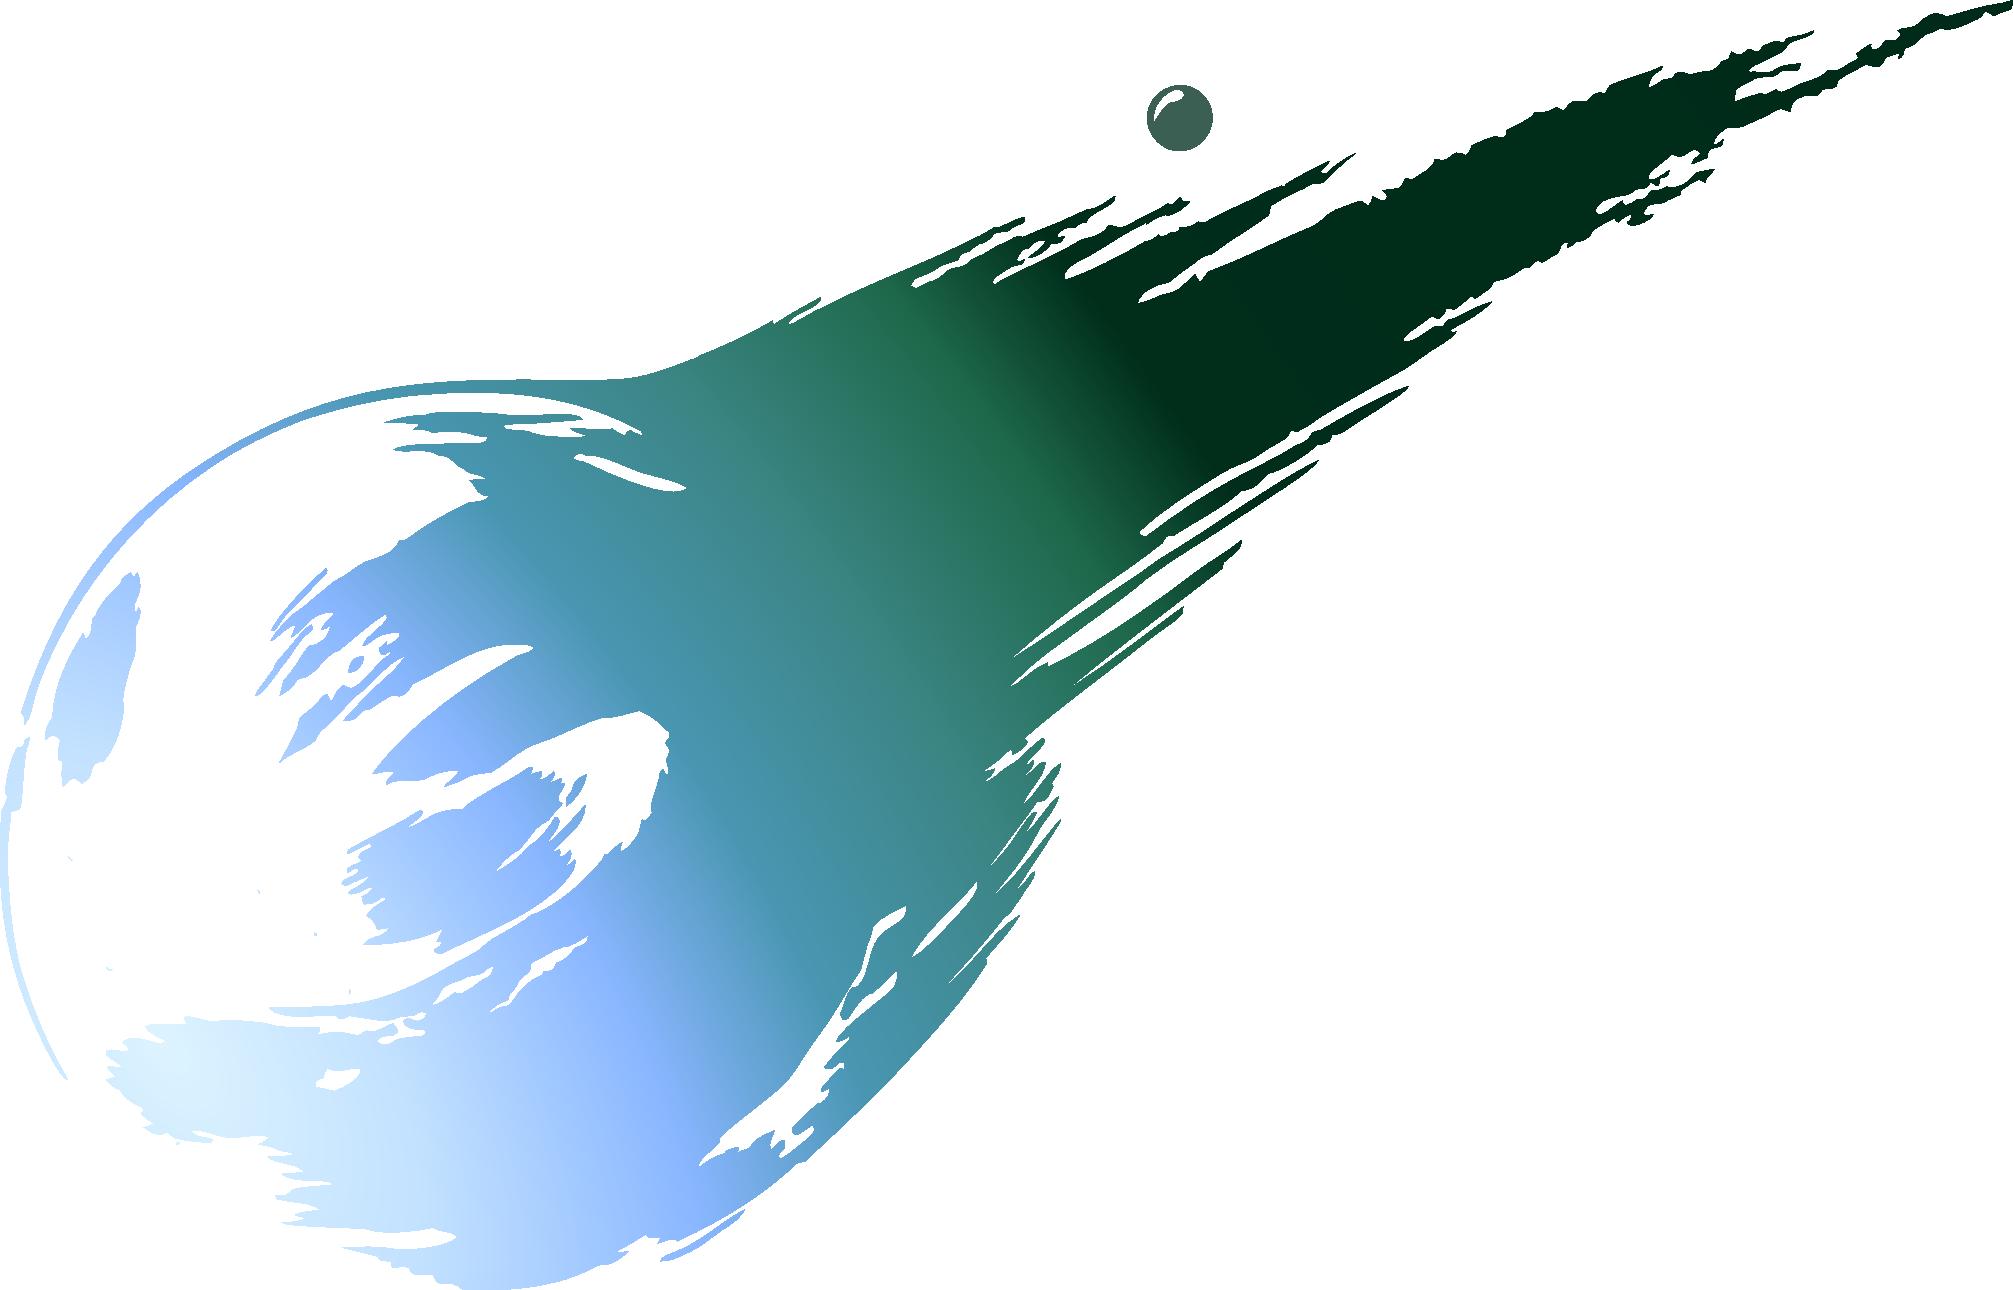 Final Fantasy VII logo by